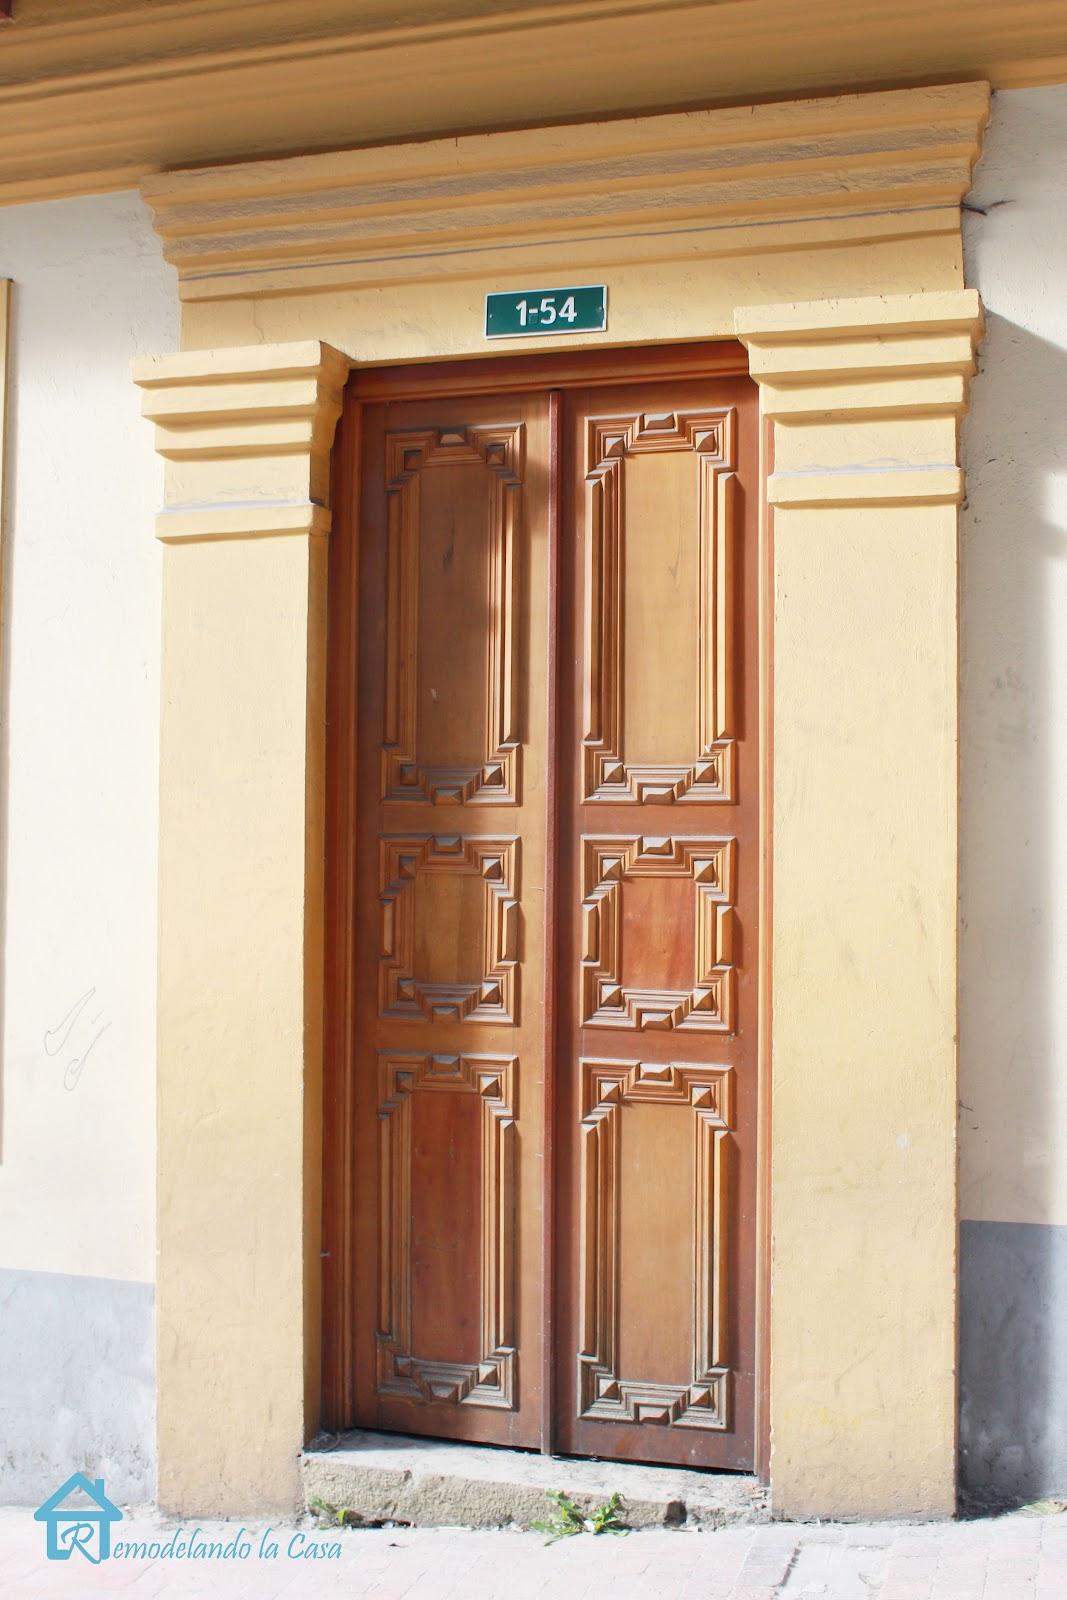 Remodelando la casa spanish style architecture for Door in spanish